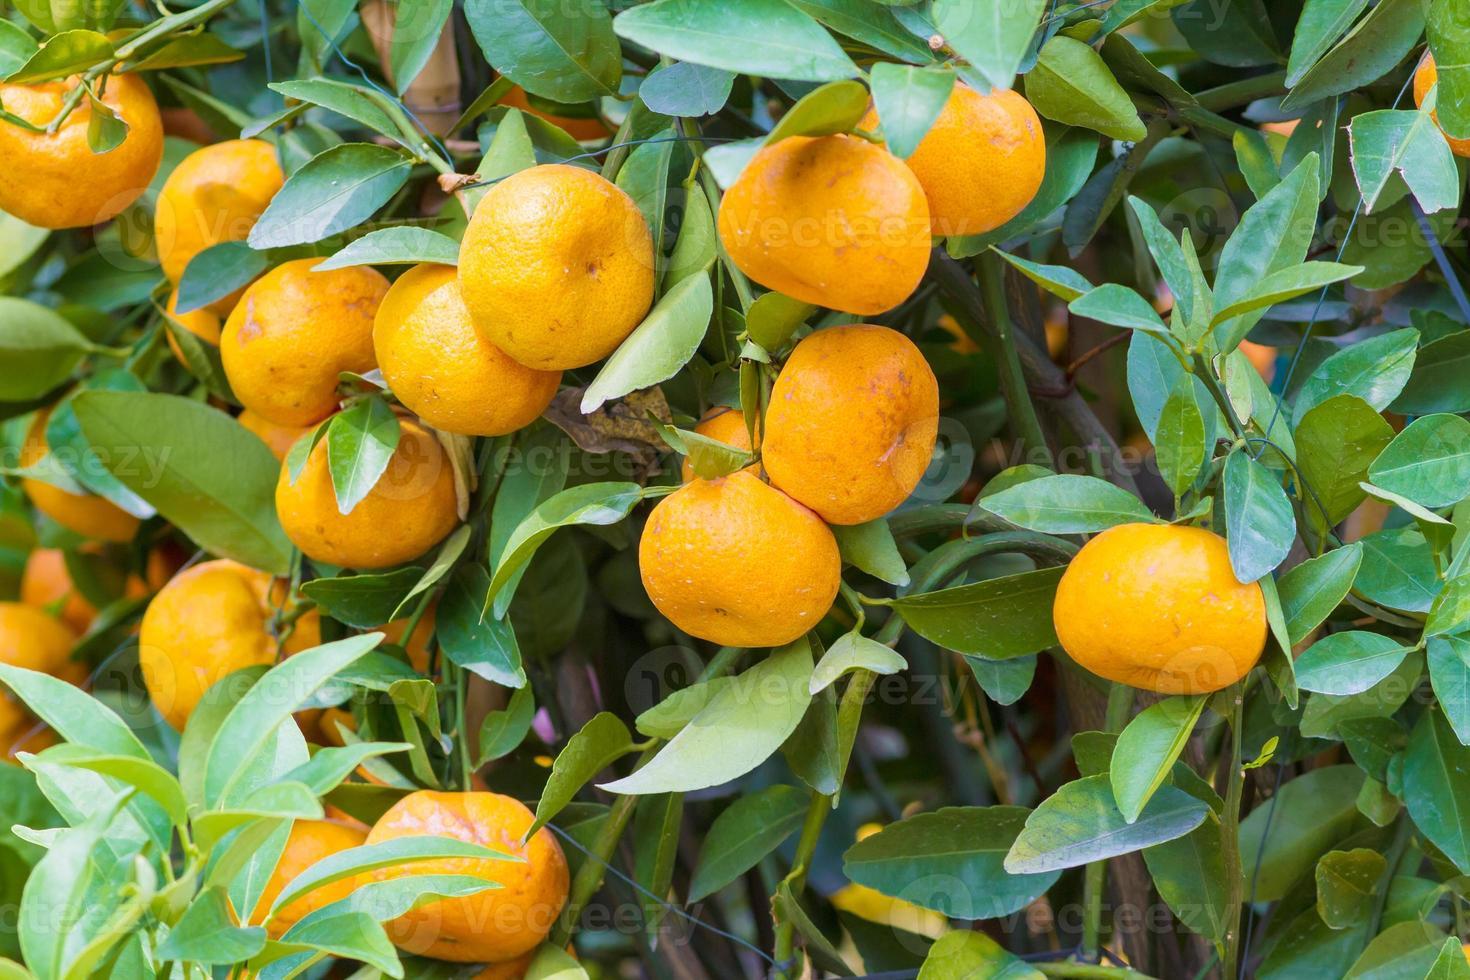 mandarijn fruitboom foto